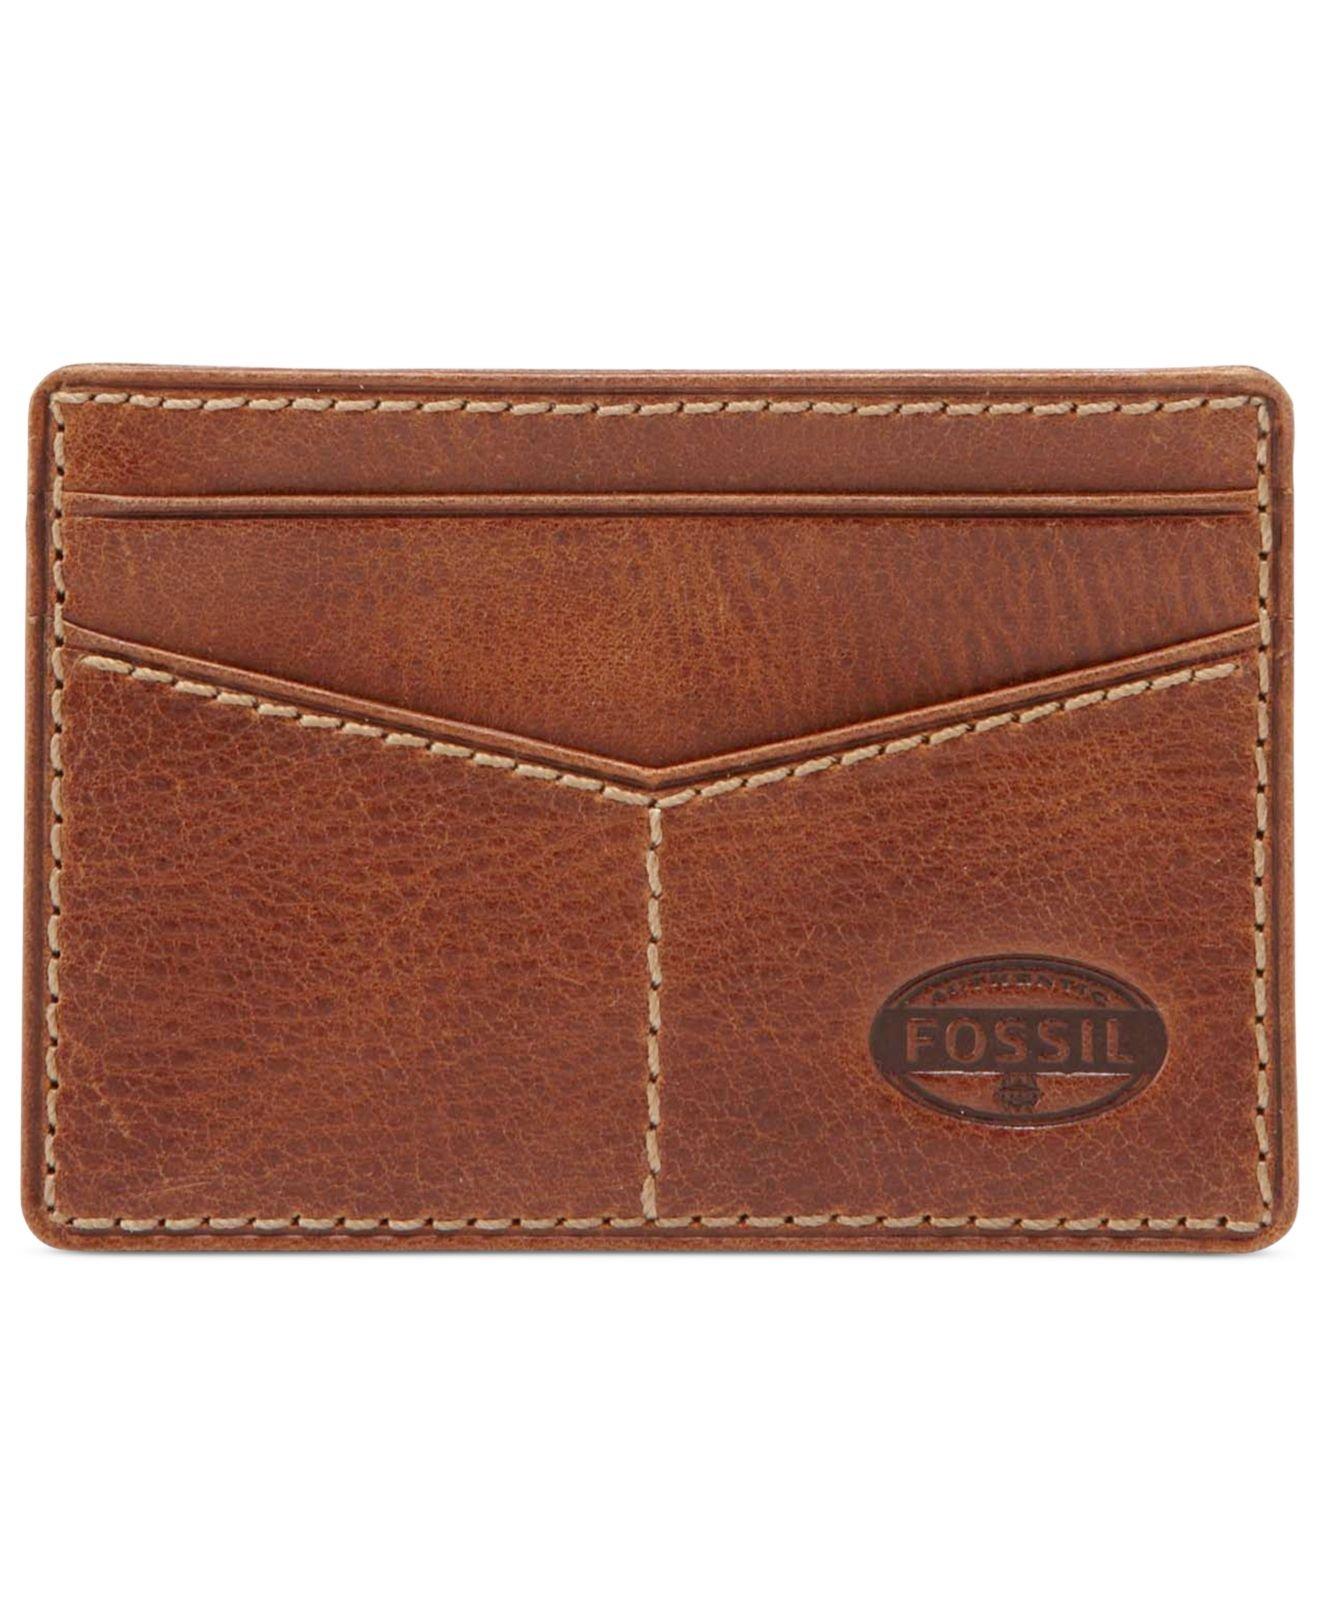 Lyst - Fossil Bradley Slim Card Case Wallet in Brown for Men